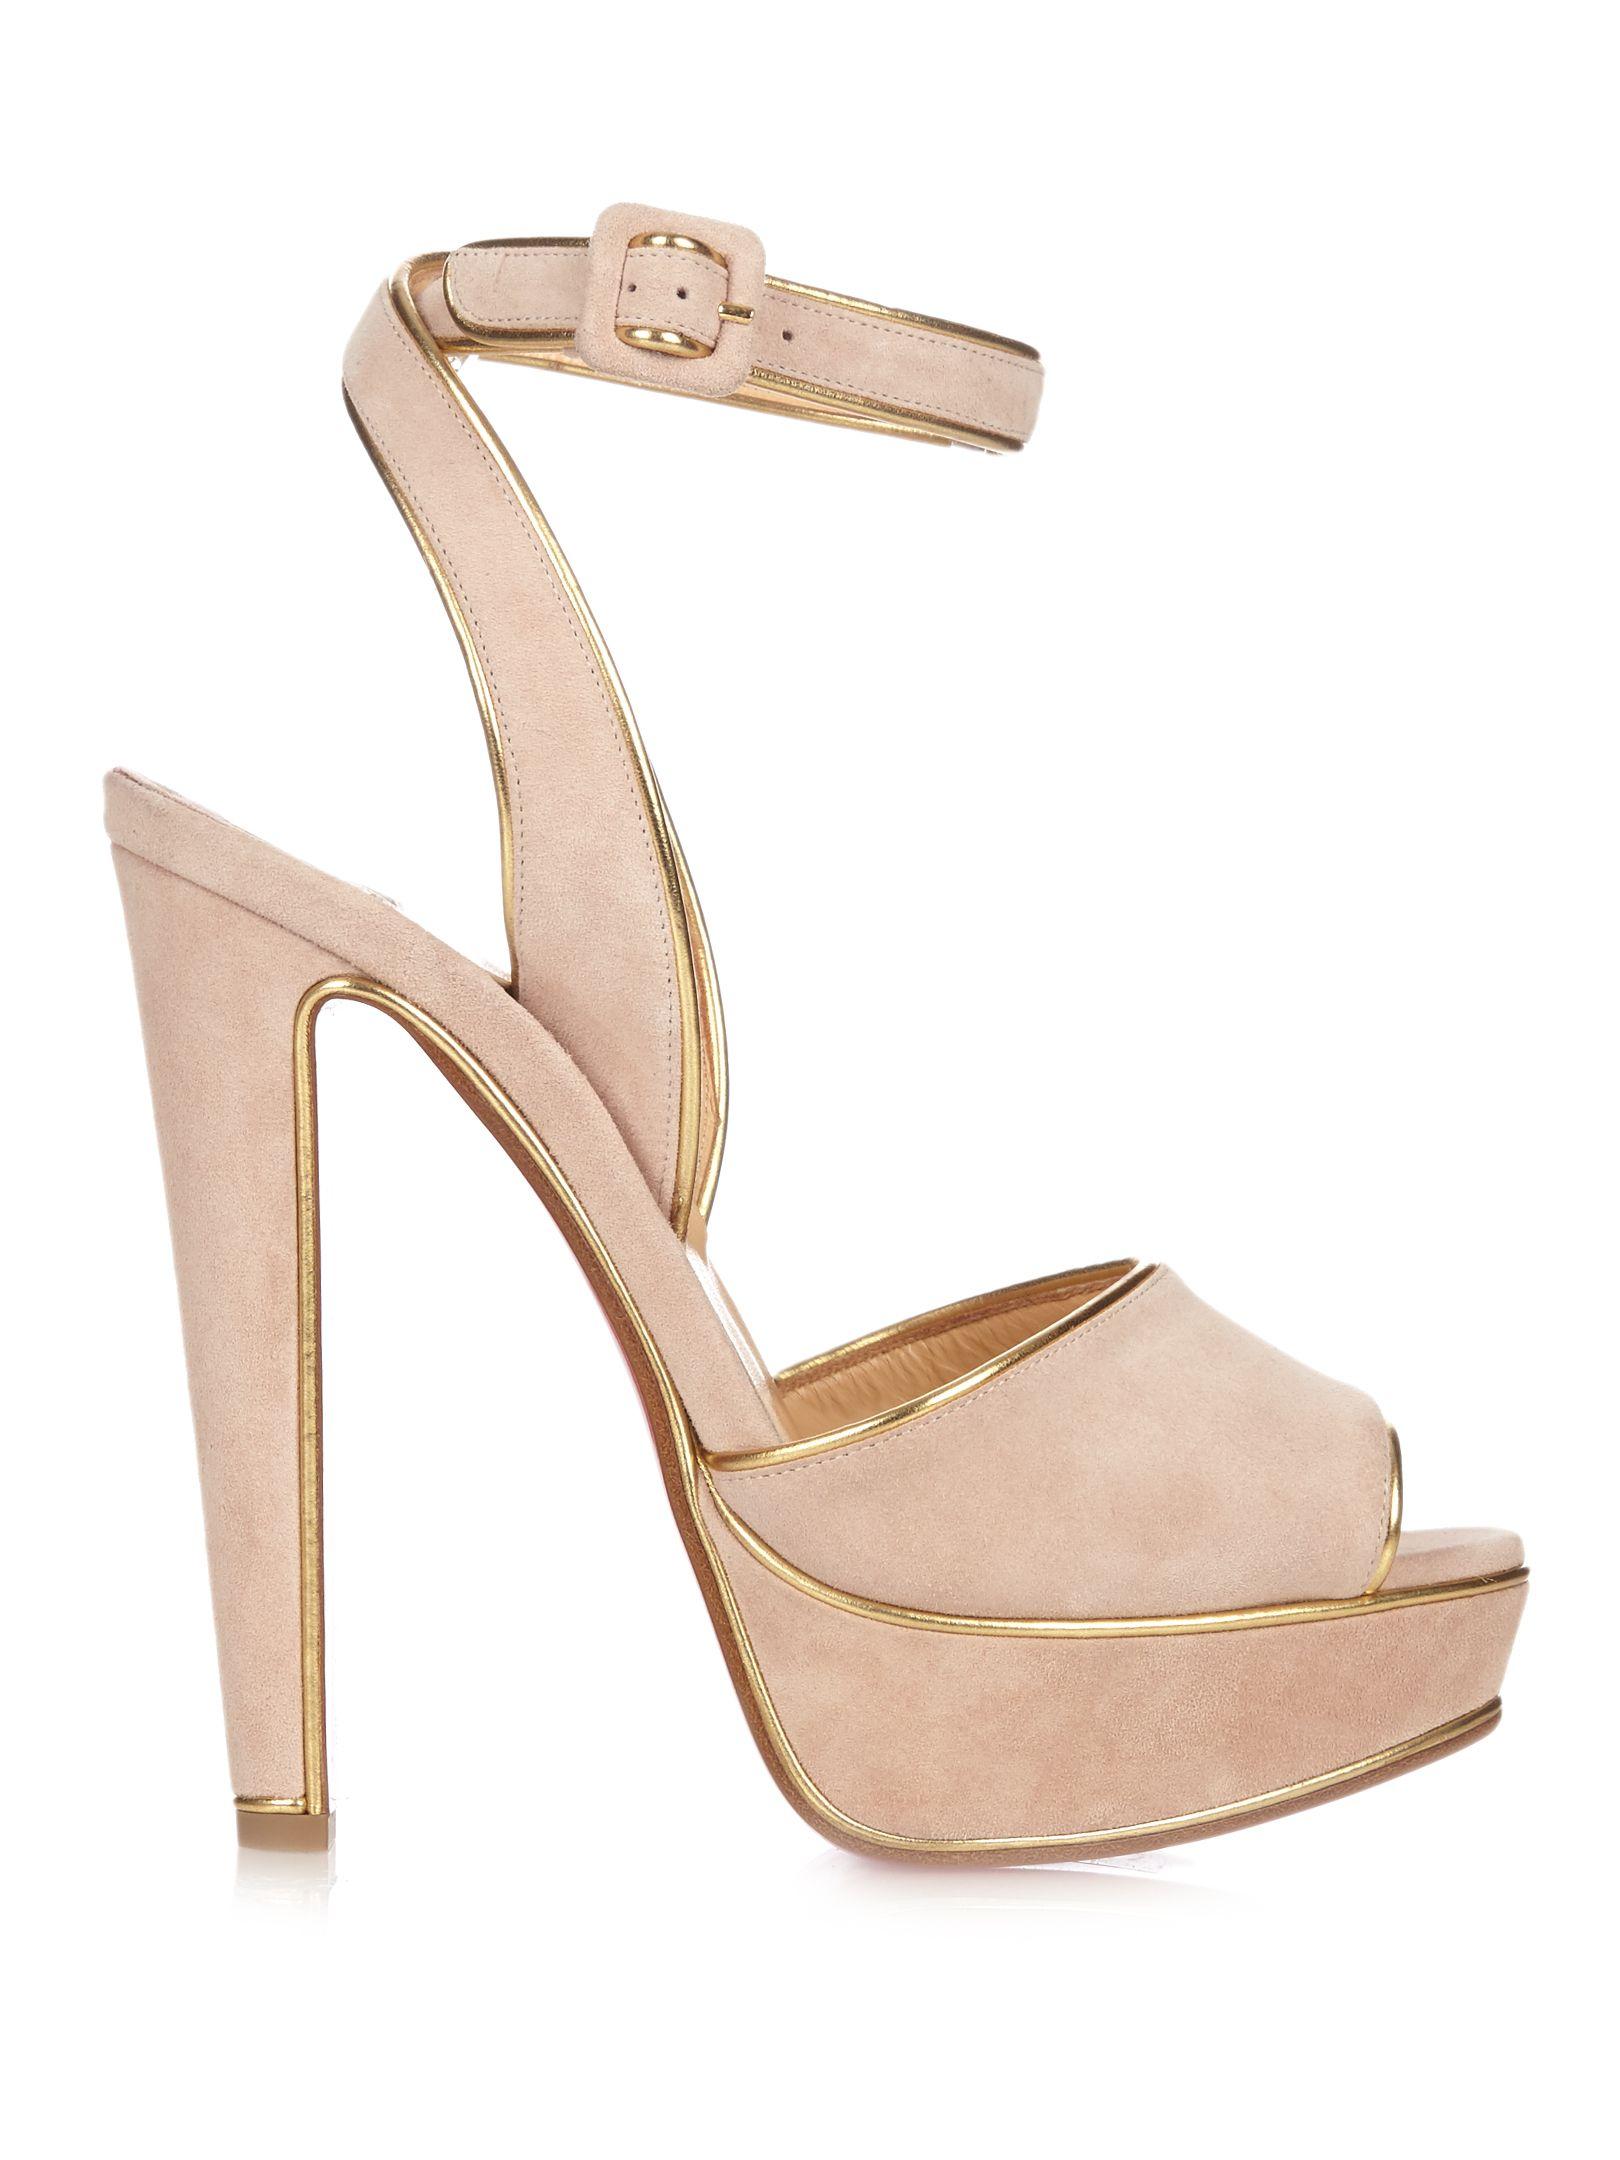 2ca0141728fa Louloudance 140mm suede platform sandals